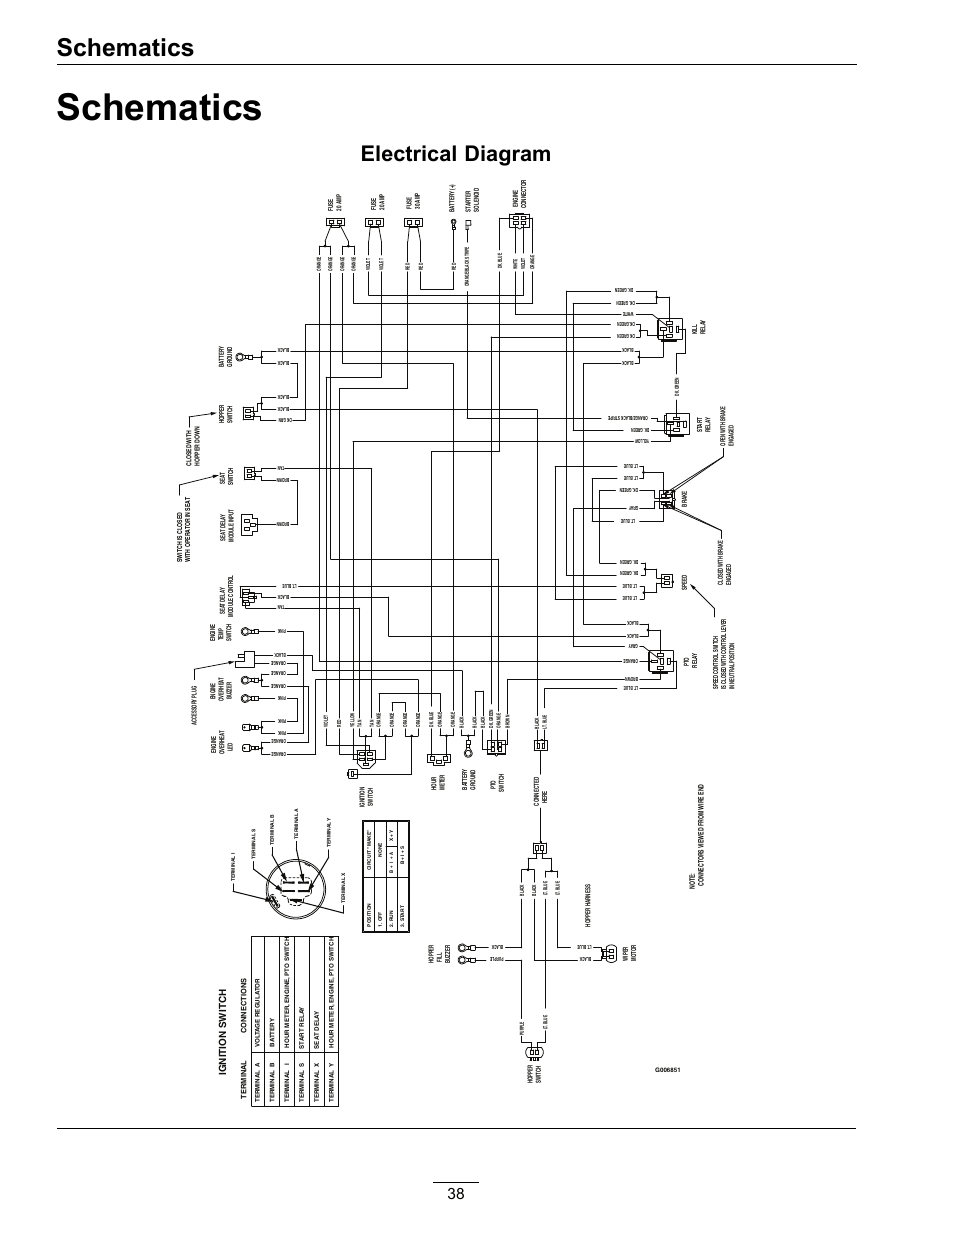 medium resolution of schematics electrical diagram exmark navigator 4500 367 user exmark electrical diagram